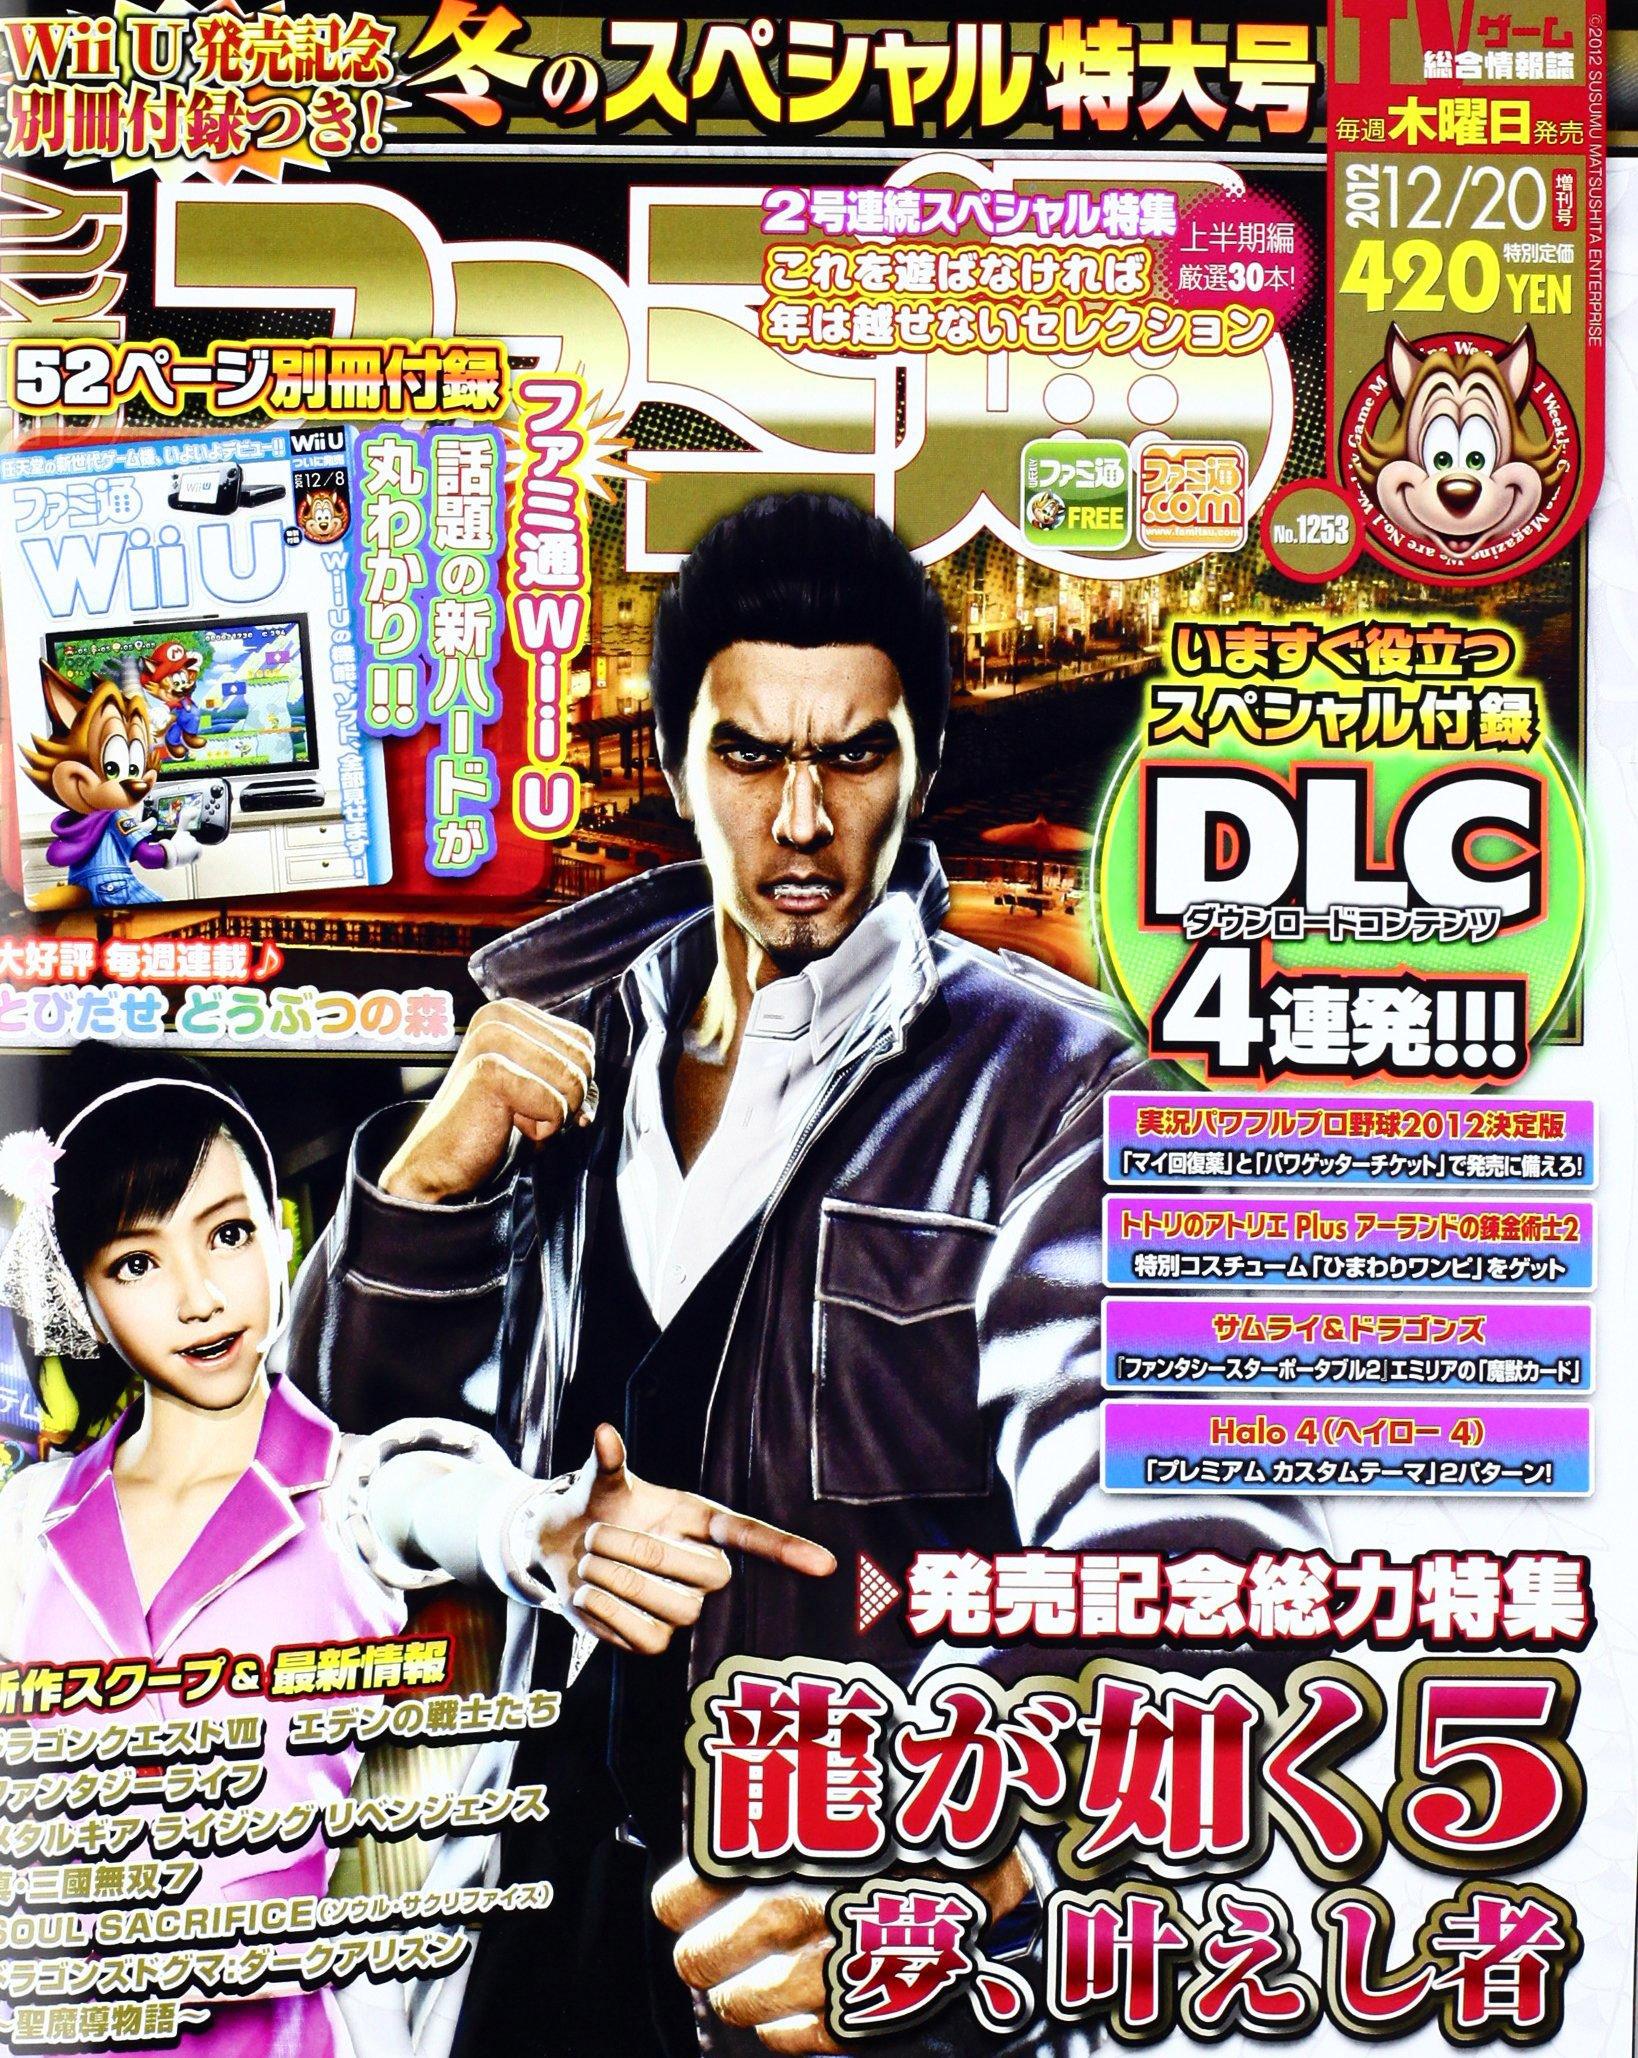 Famitsu 1253 (December 20, 2012)